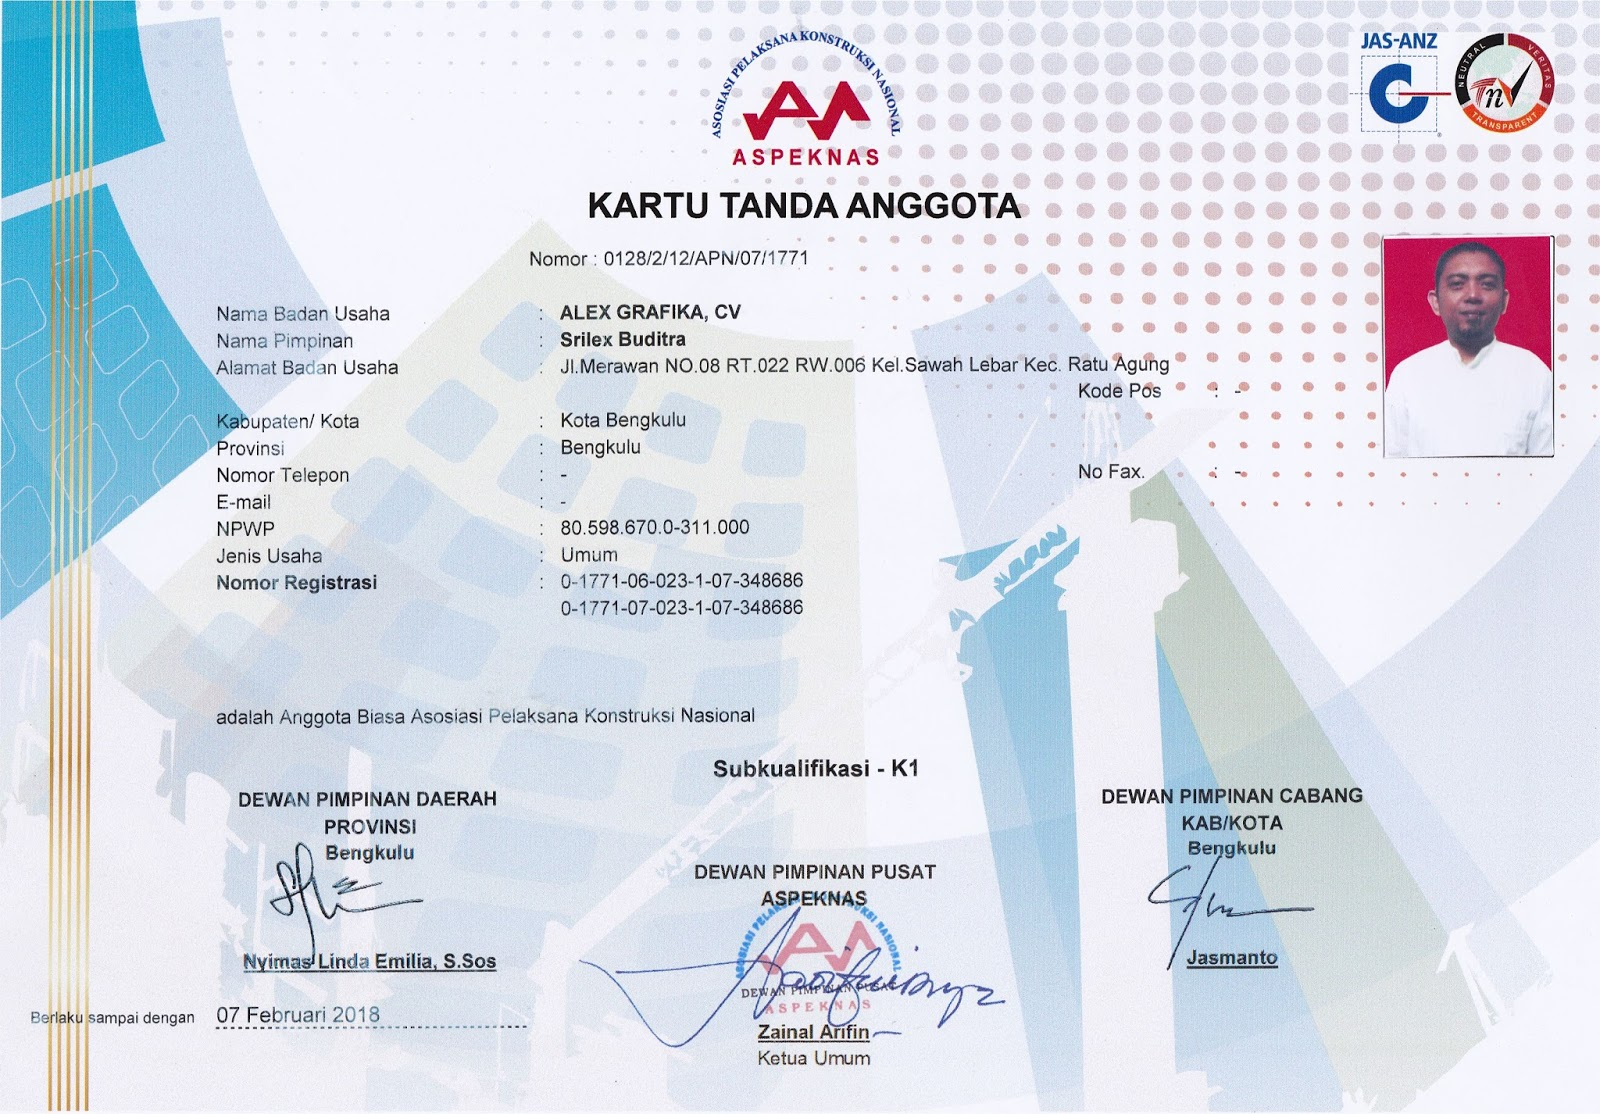 Kartu Tanda Anggota LPJK CV. ALEX GRAFIKA